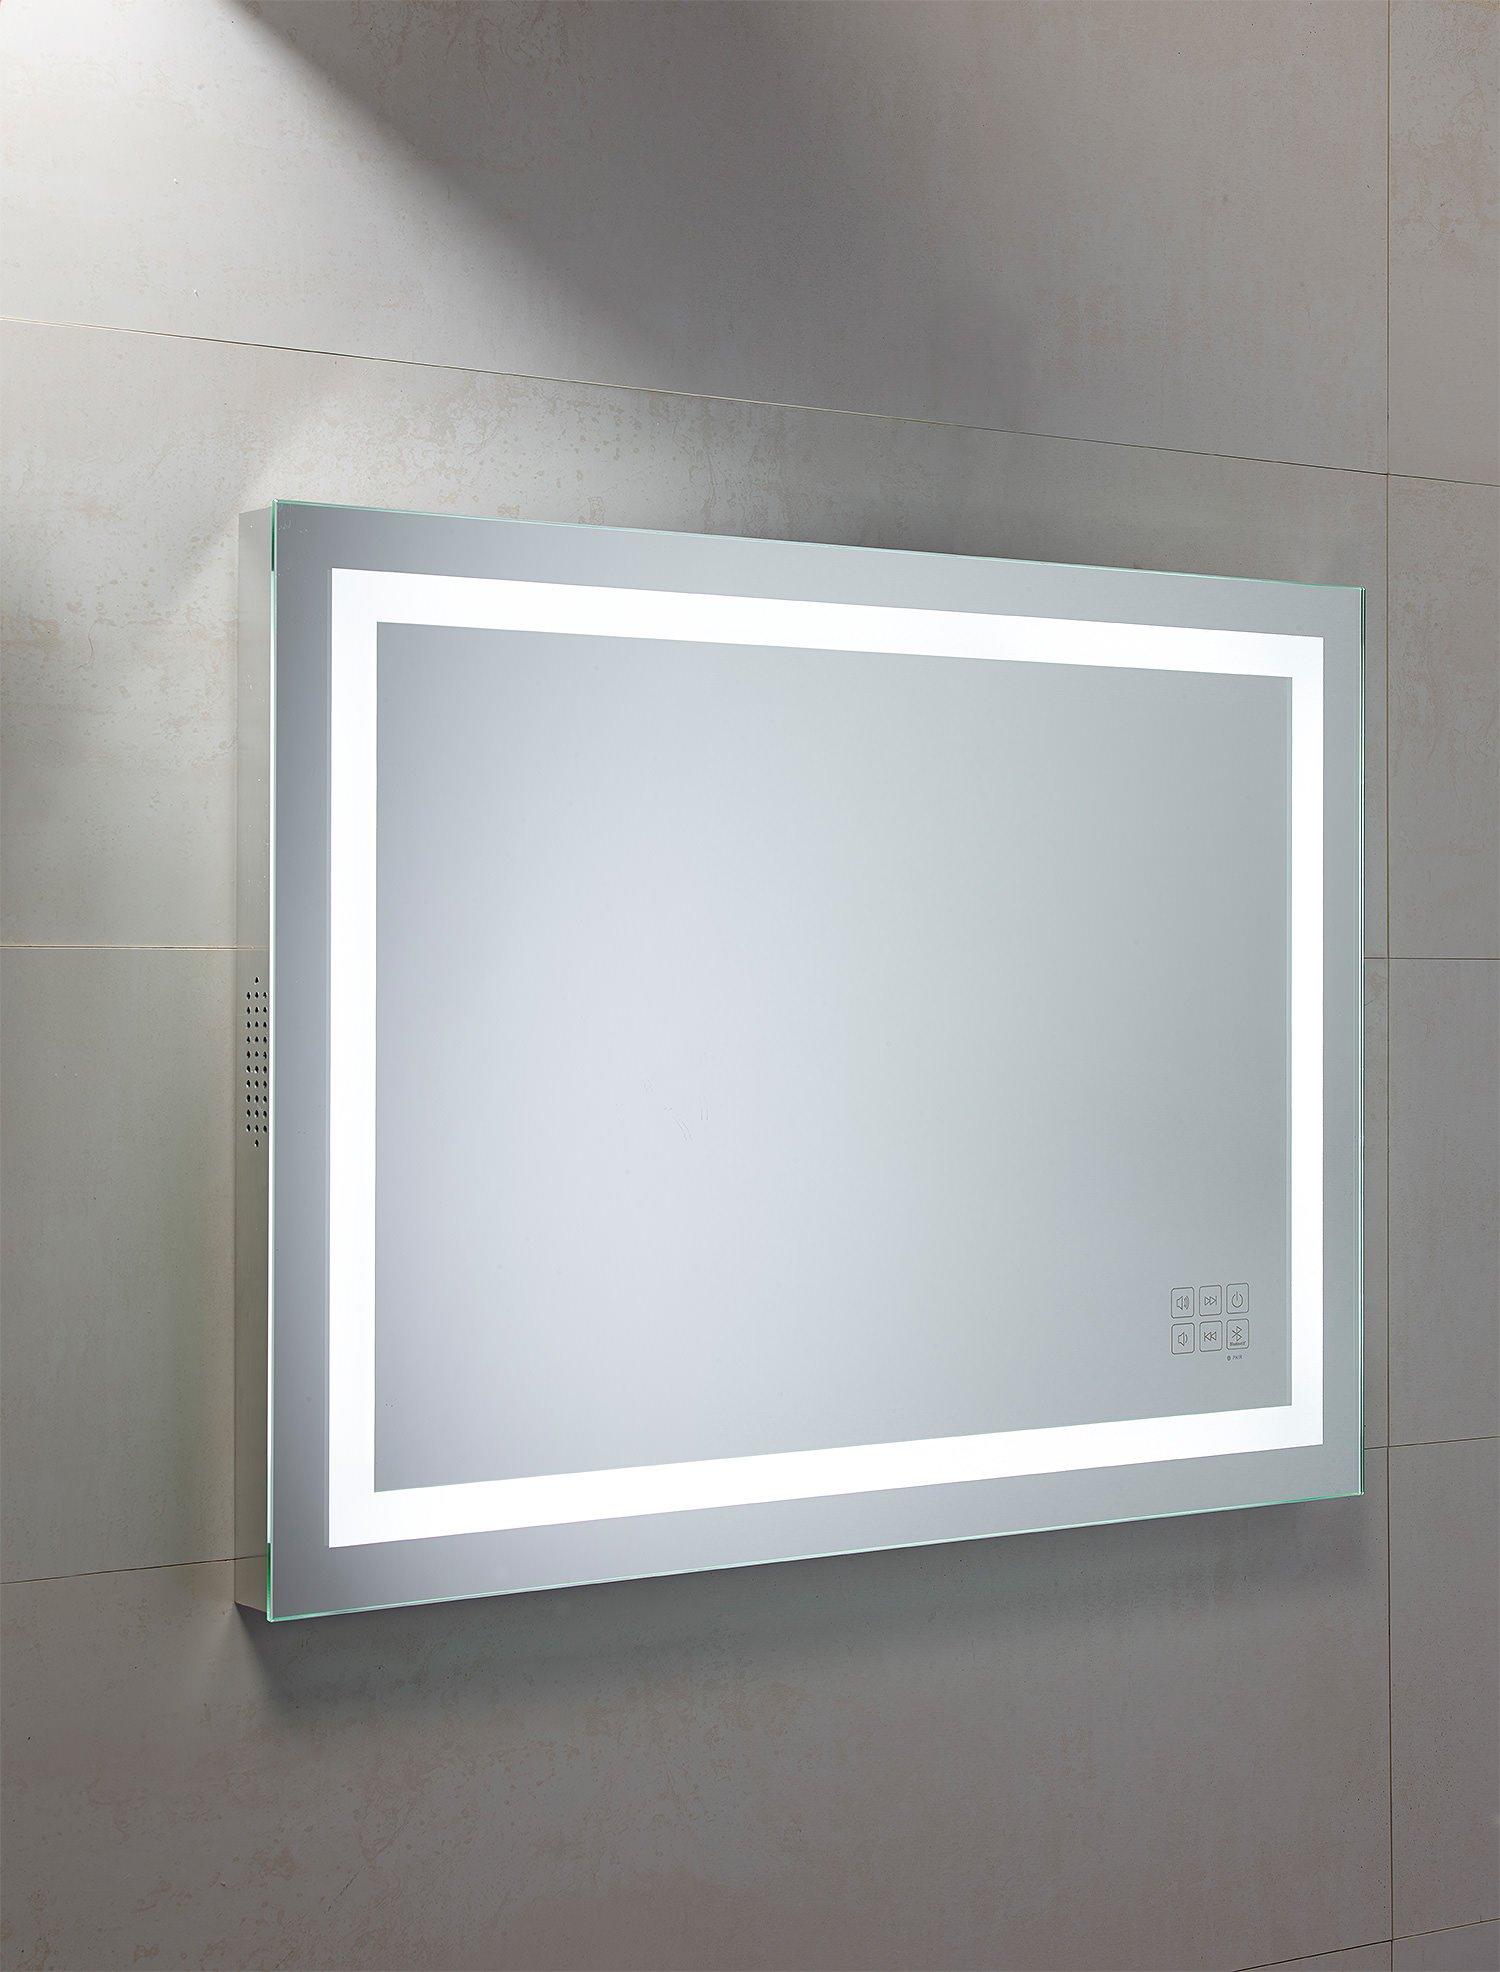 Roper rhodes beat 800mm illuminated bluetooth mirror for Illuminated mirrors